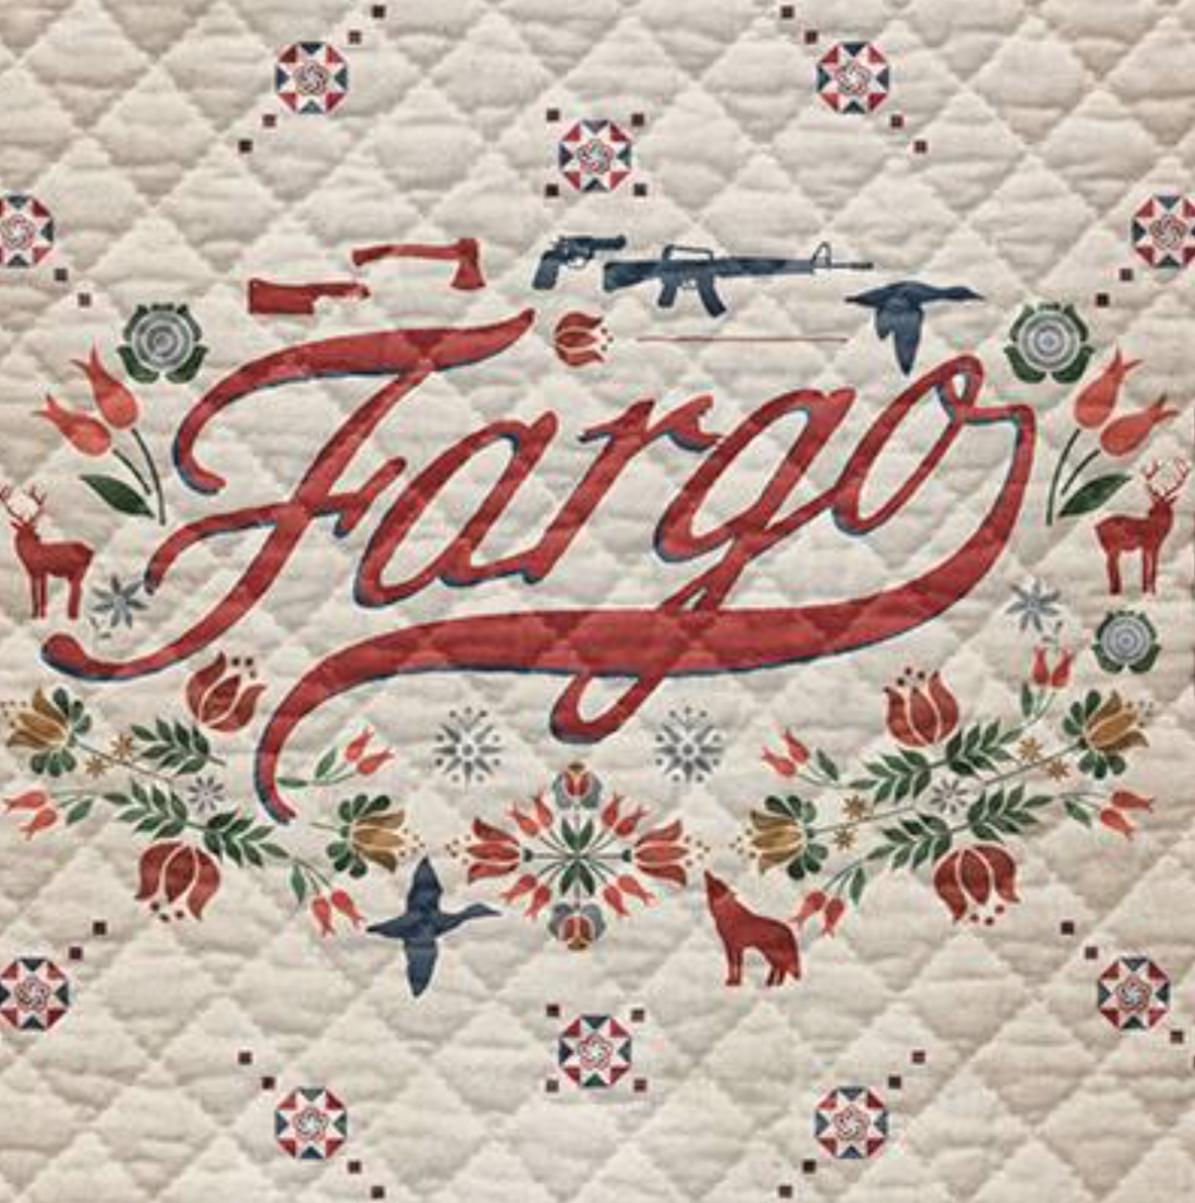 Fargo 2 stagione